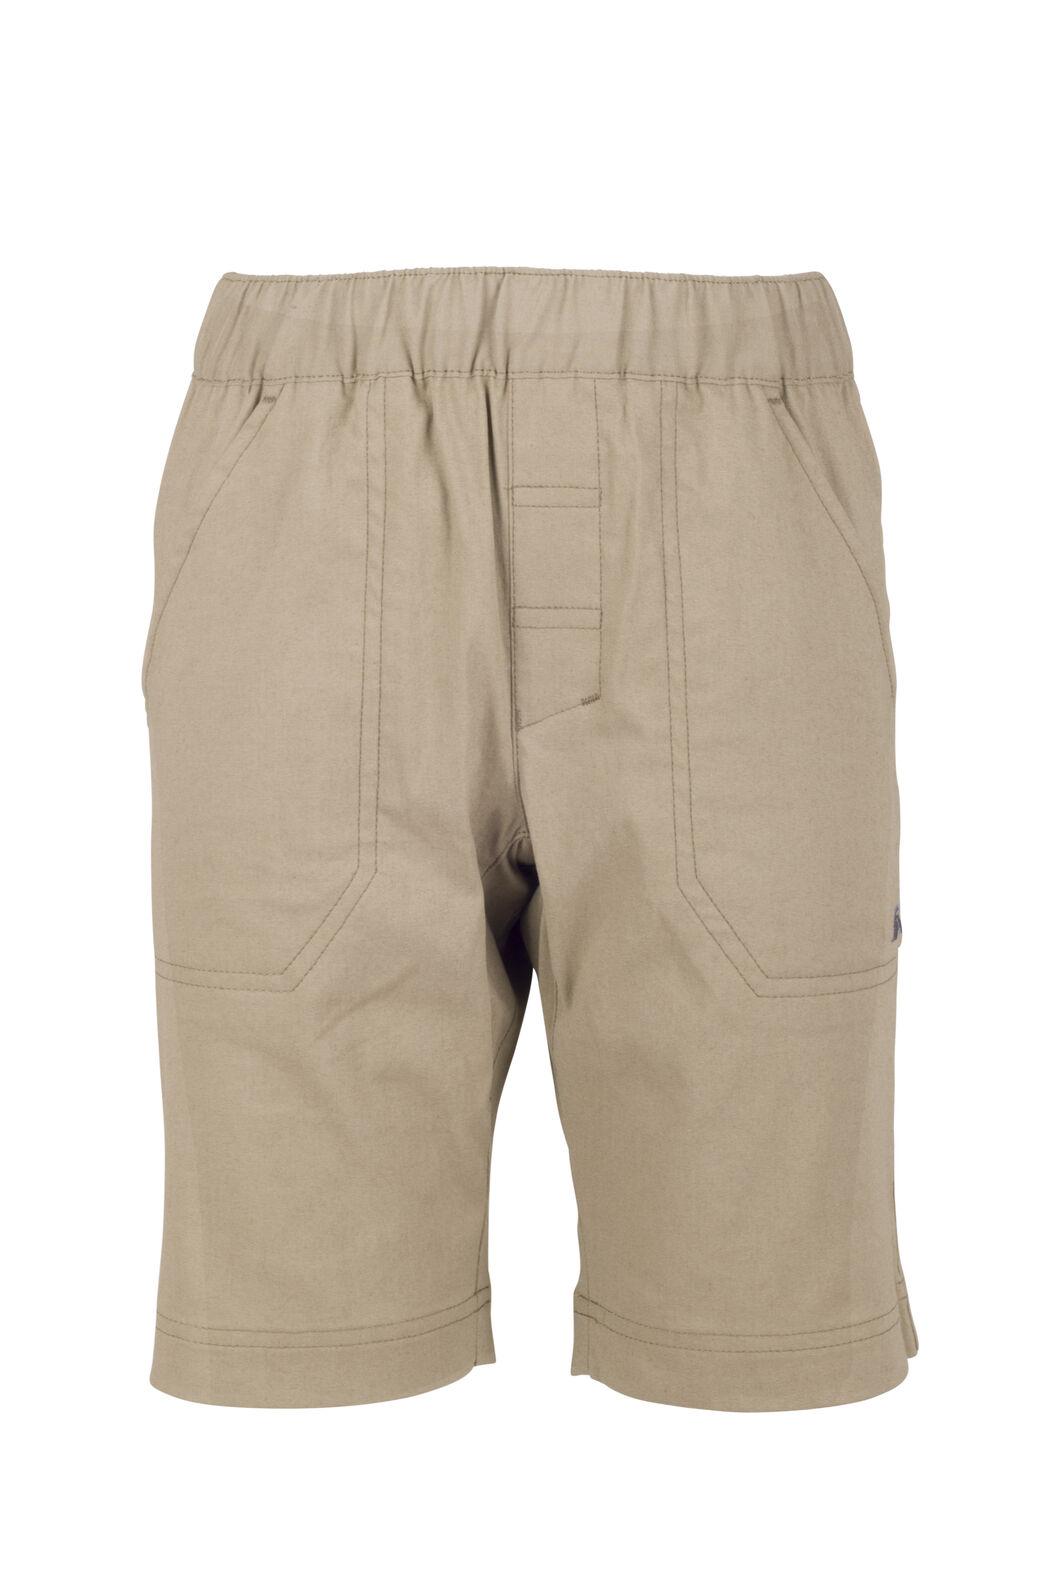 Macpac Piha Shorts - Kids', Covert Green, hi-res